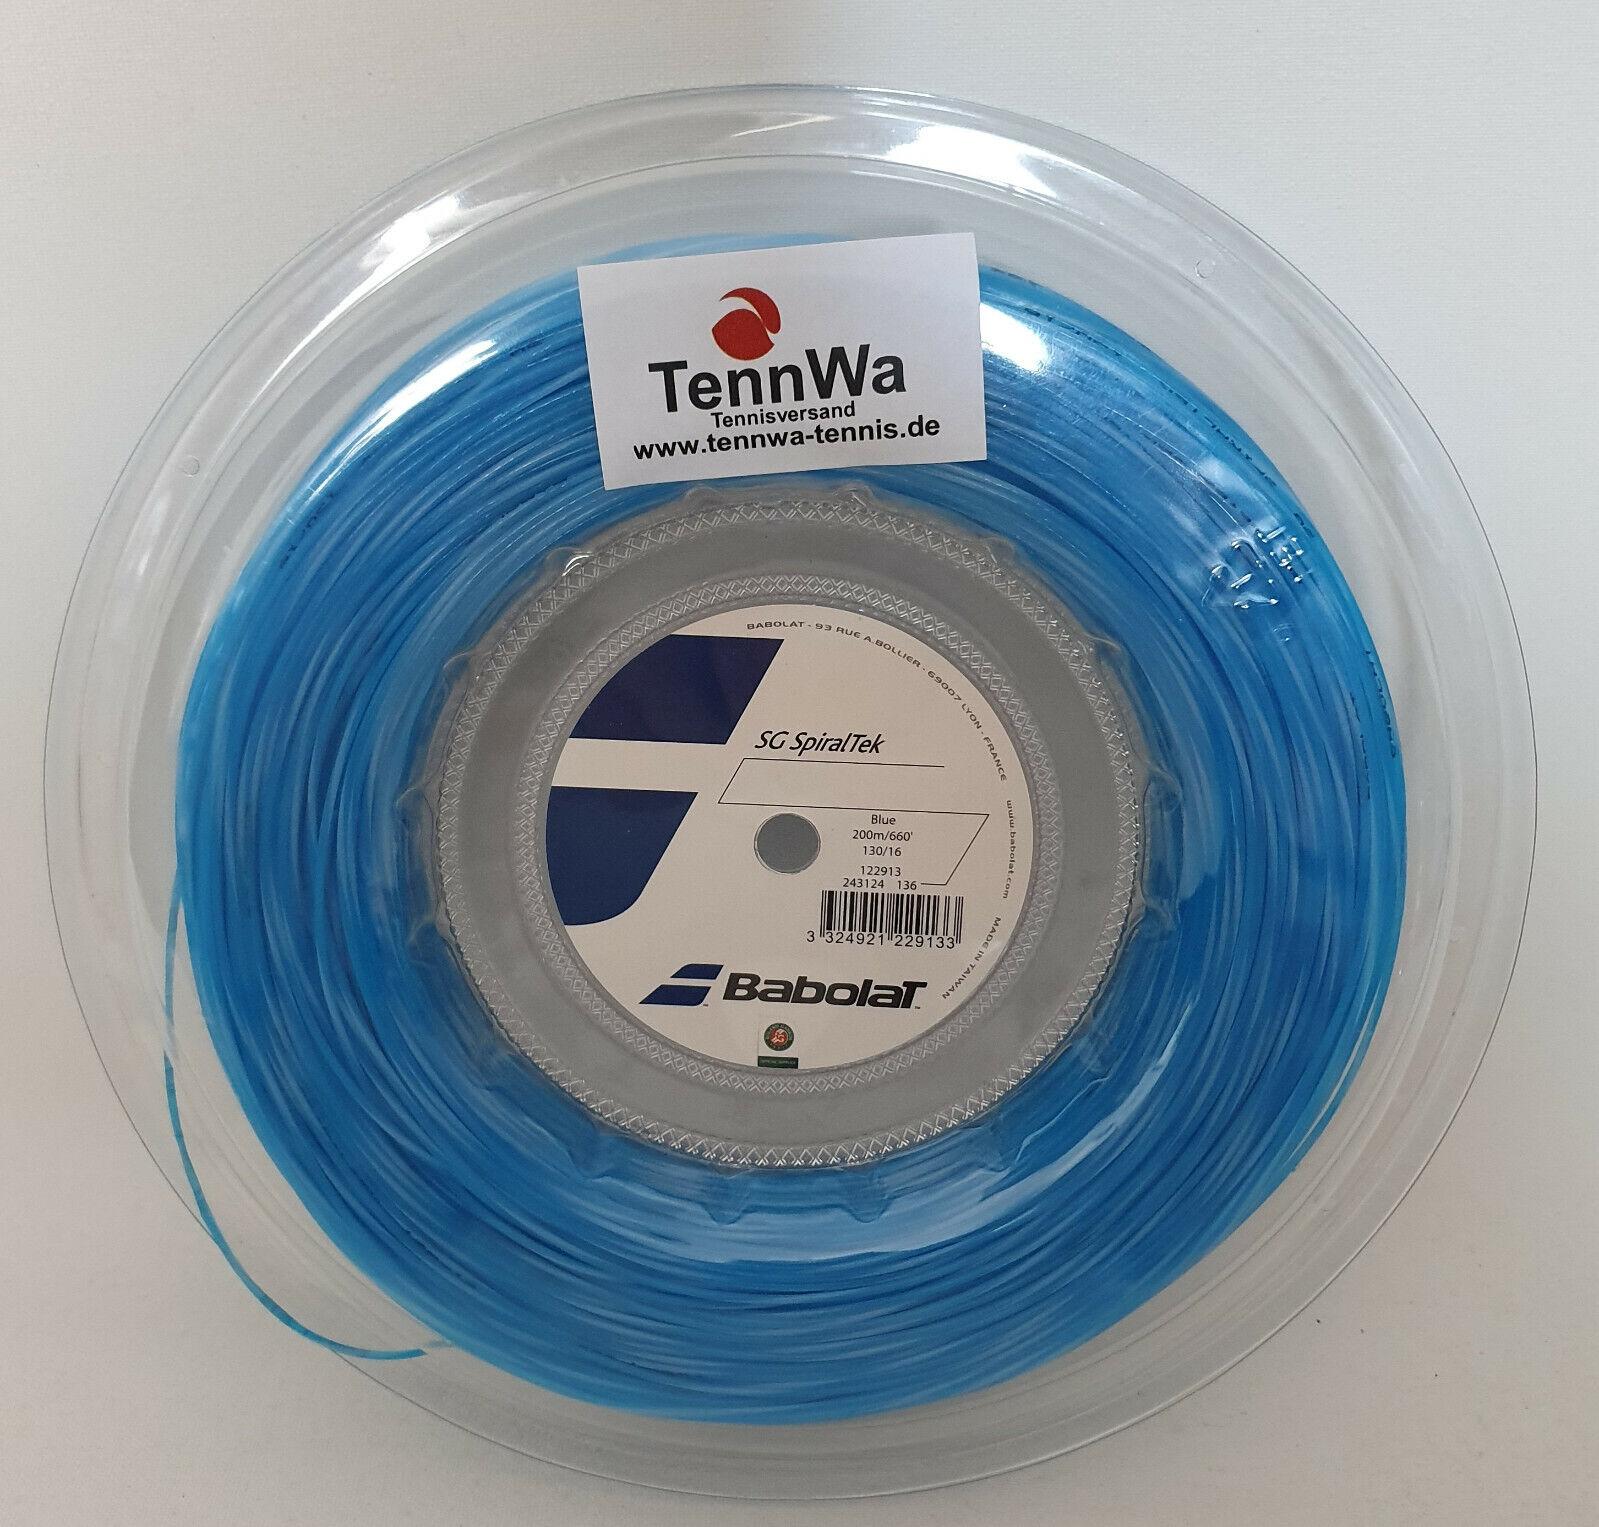 200m (0,4 065533;  lfdm) Babolat SG SpiralTek blau --Multifilamannent Tennissaite UVP150 groenel5533;